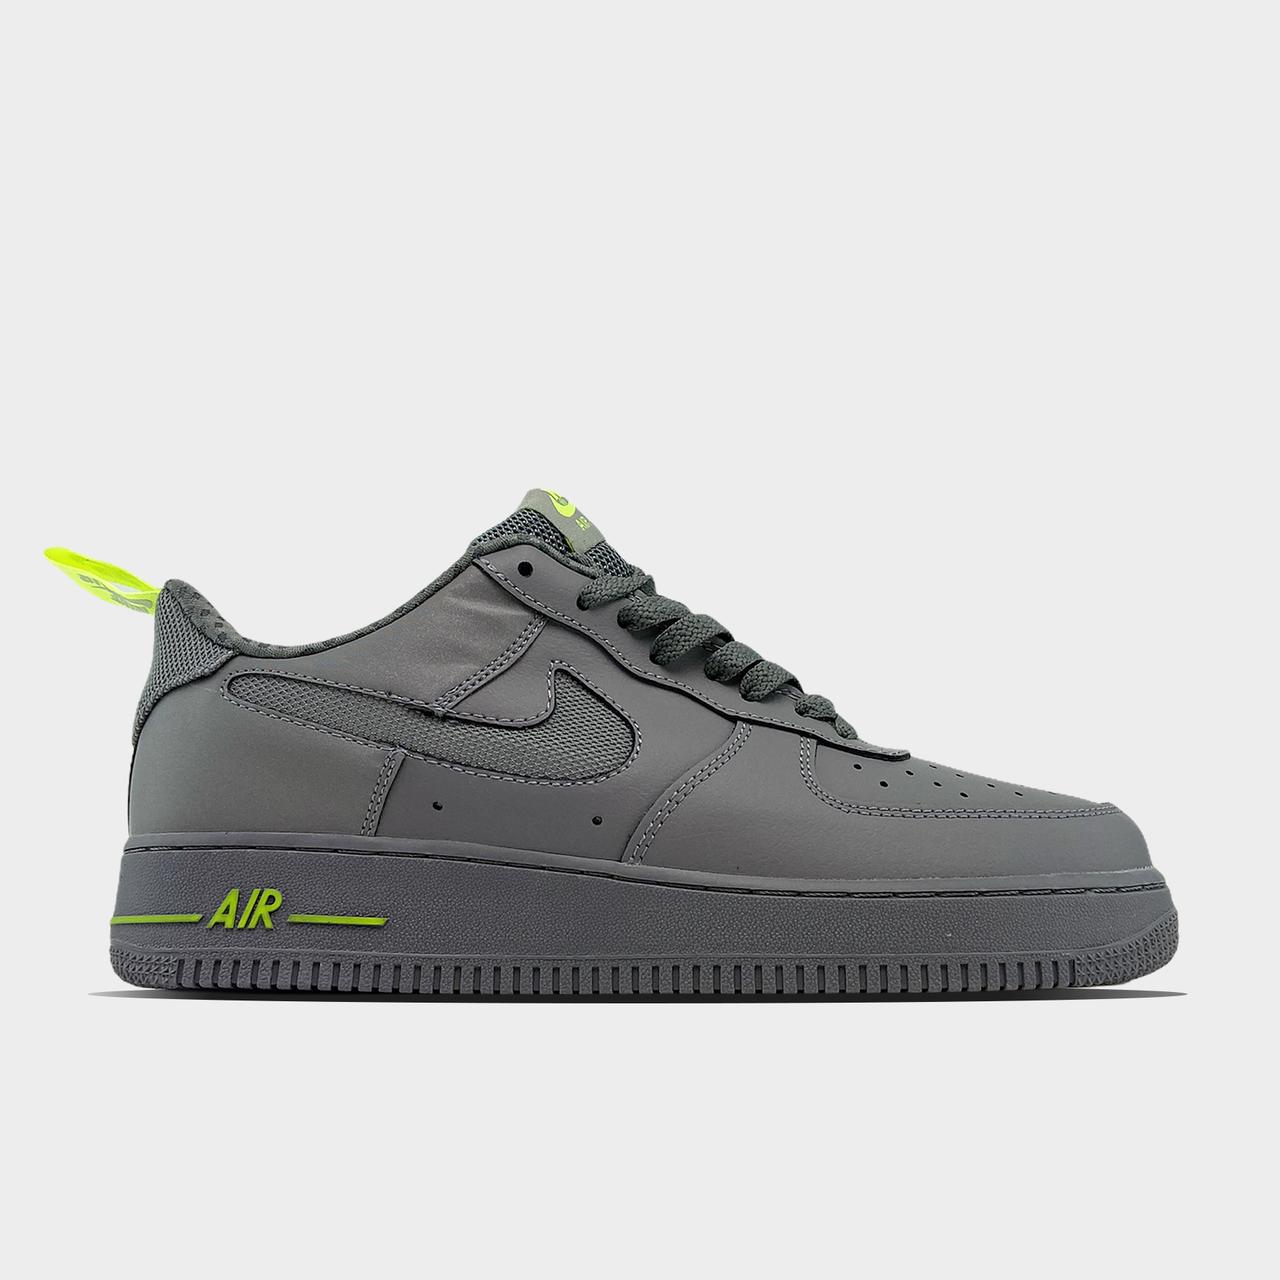 Кроссовки Nike Air Force 1 Low Gray Green мужские, серого цвета, Найк Аир Форс 42